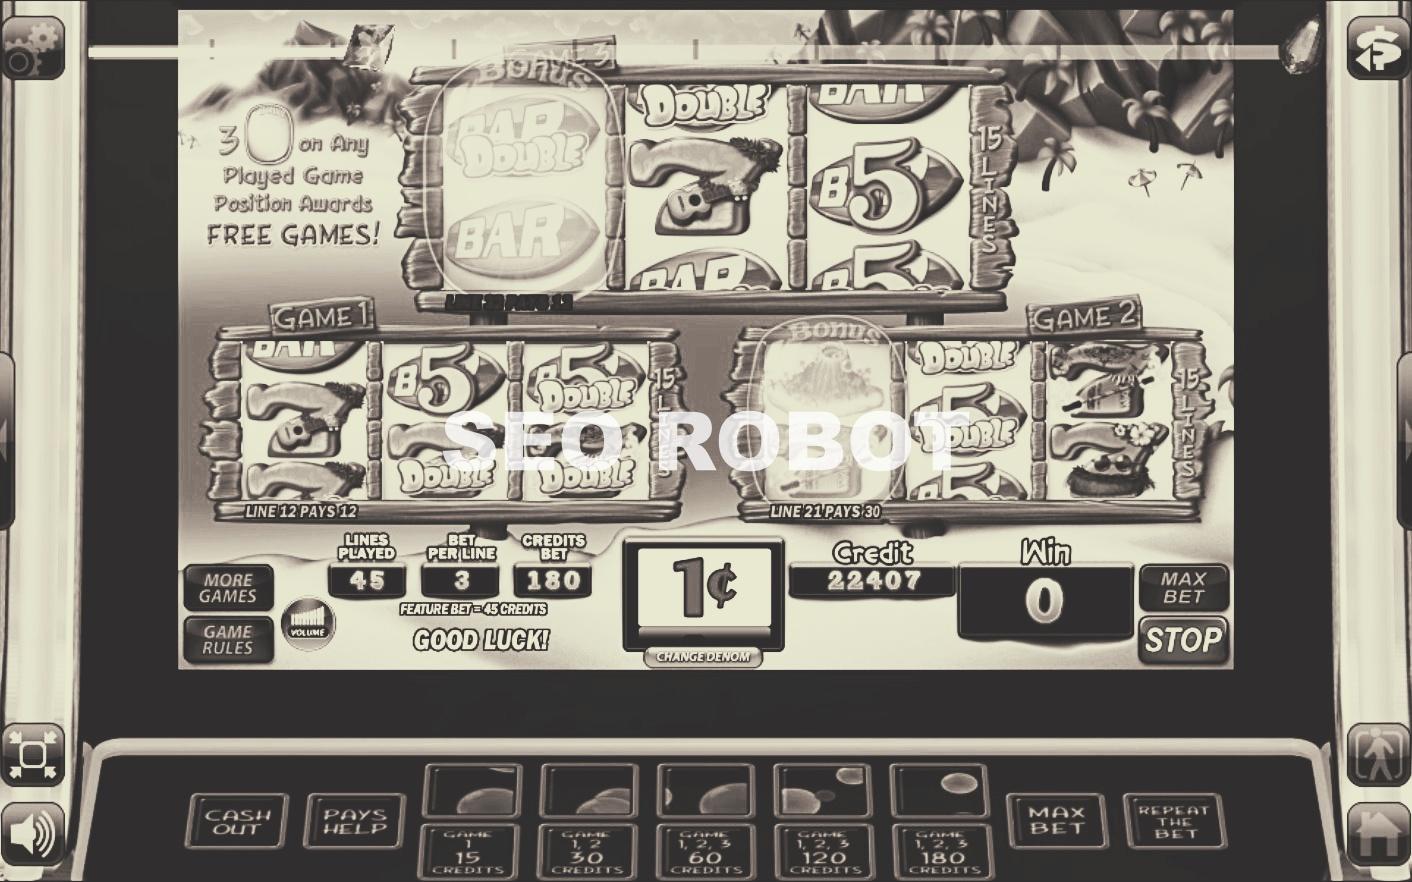 Langkah-langkah praktis Cara memenangkan slot online